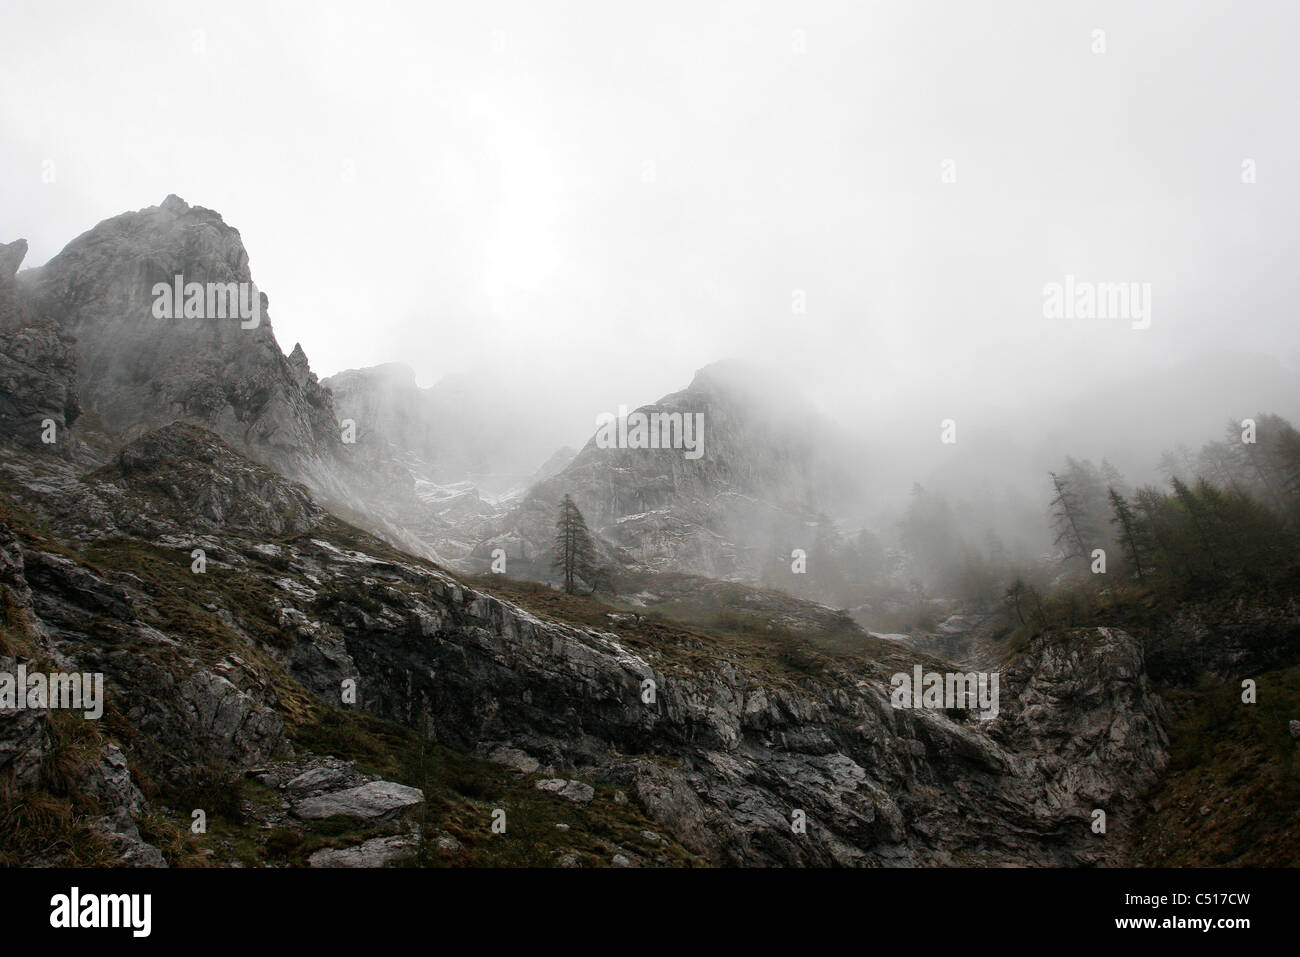 Foggy mountain landscape - Stock Image